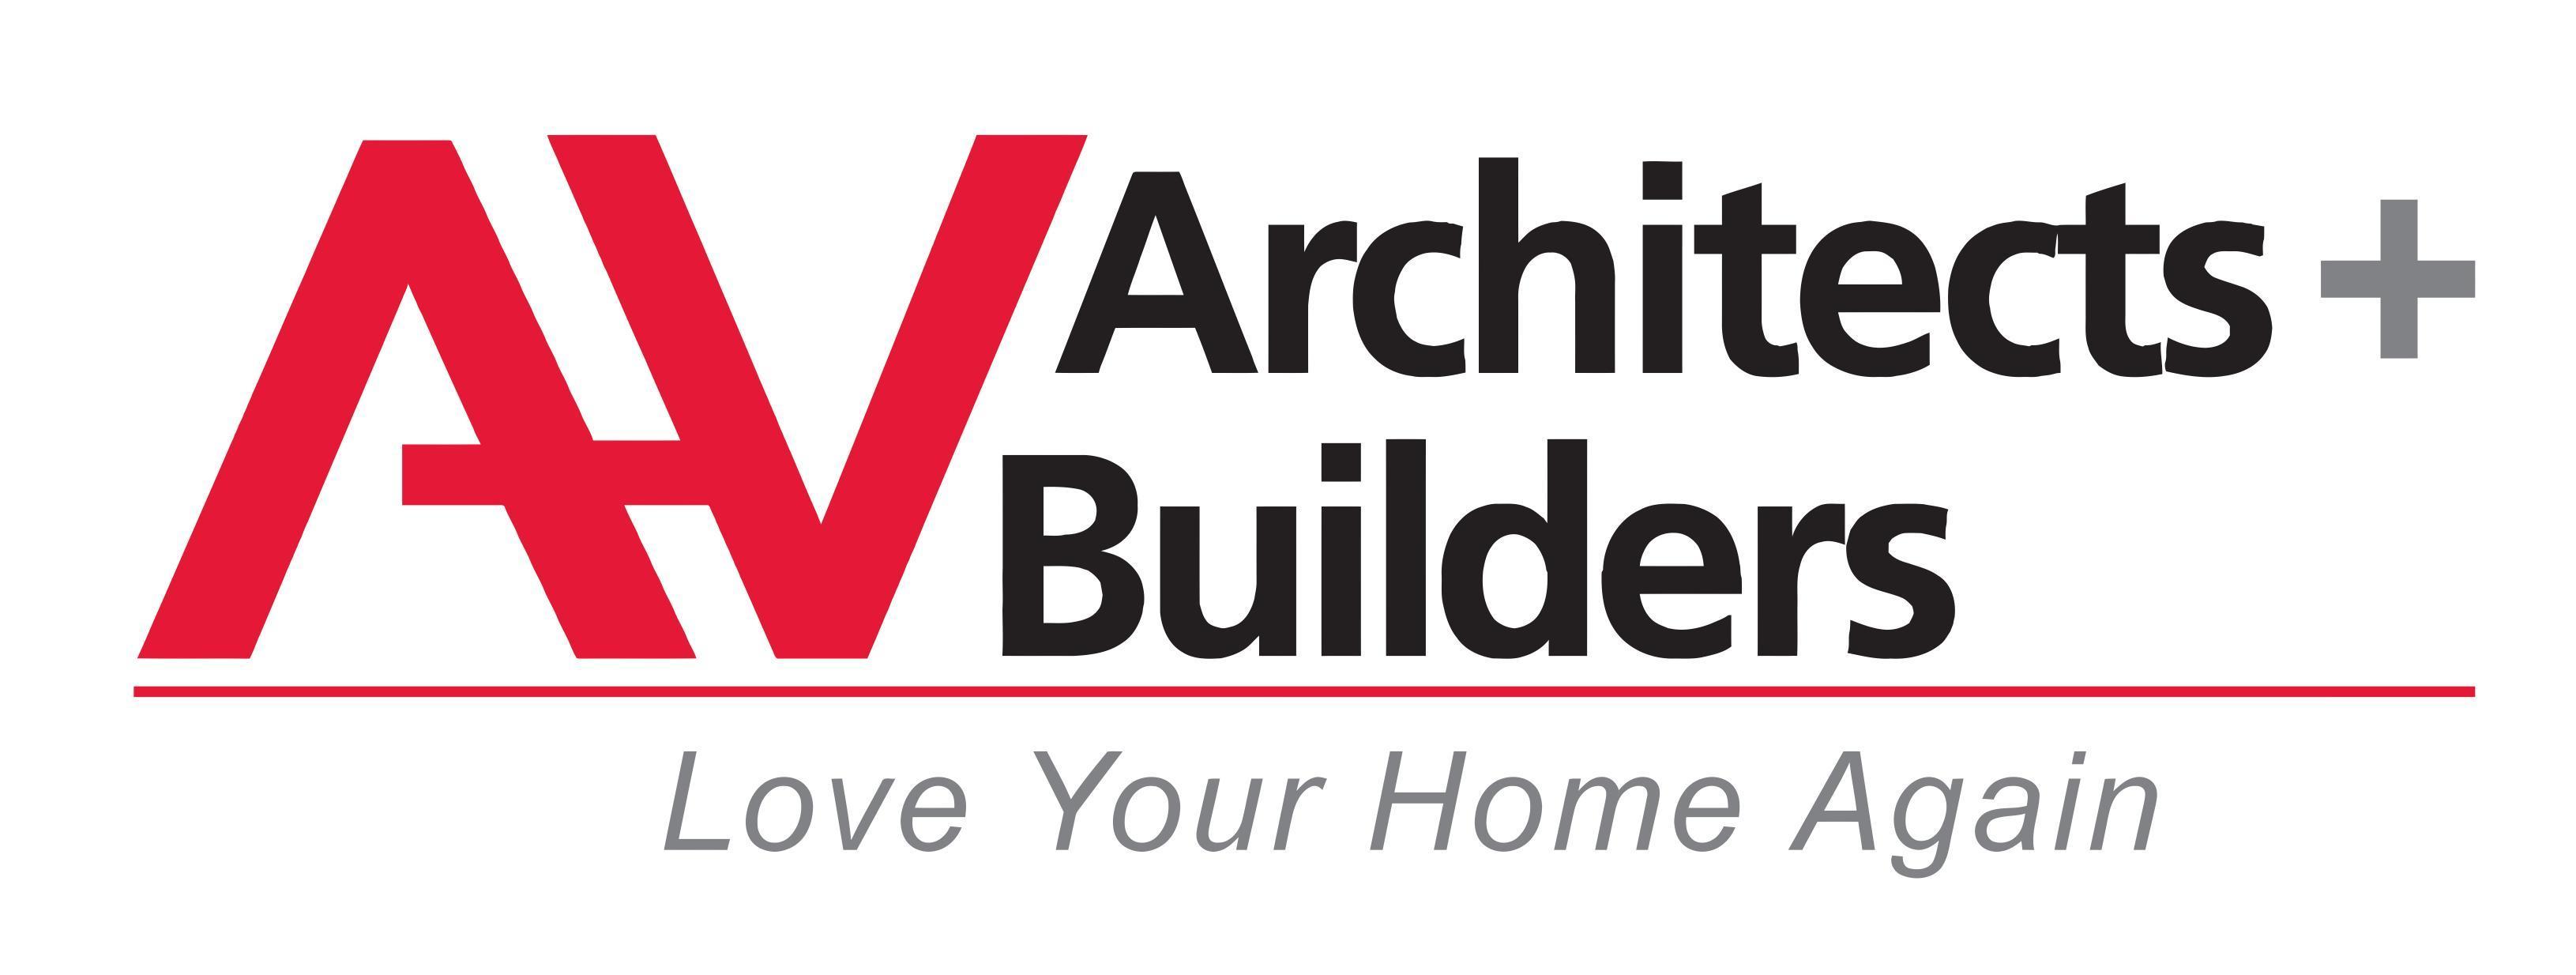 AV Architects and Builders